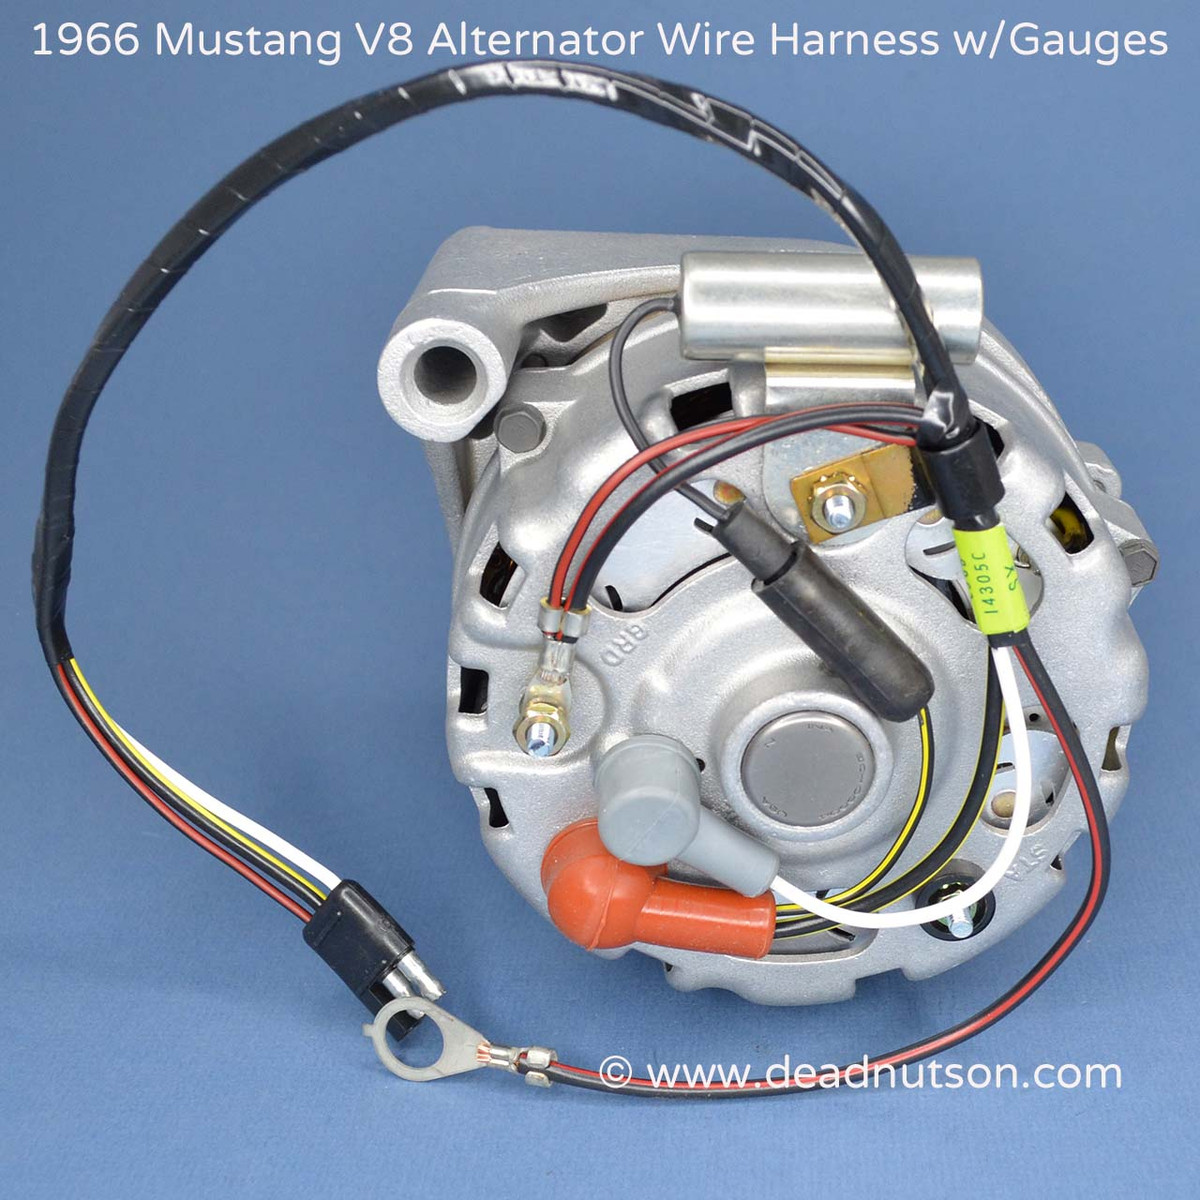 medium resolution of  1964 1965 mustang alternator wire harness tag 289 w instrument gauges